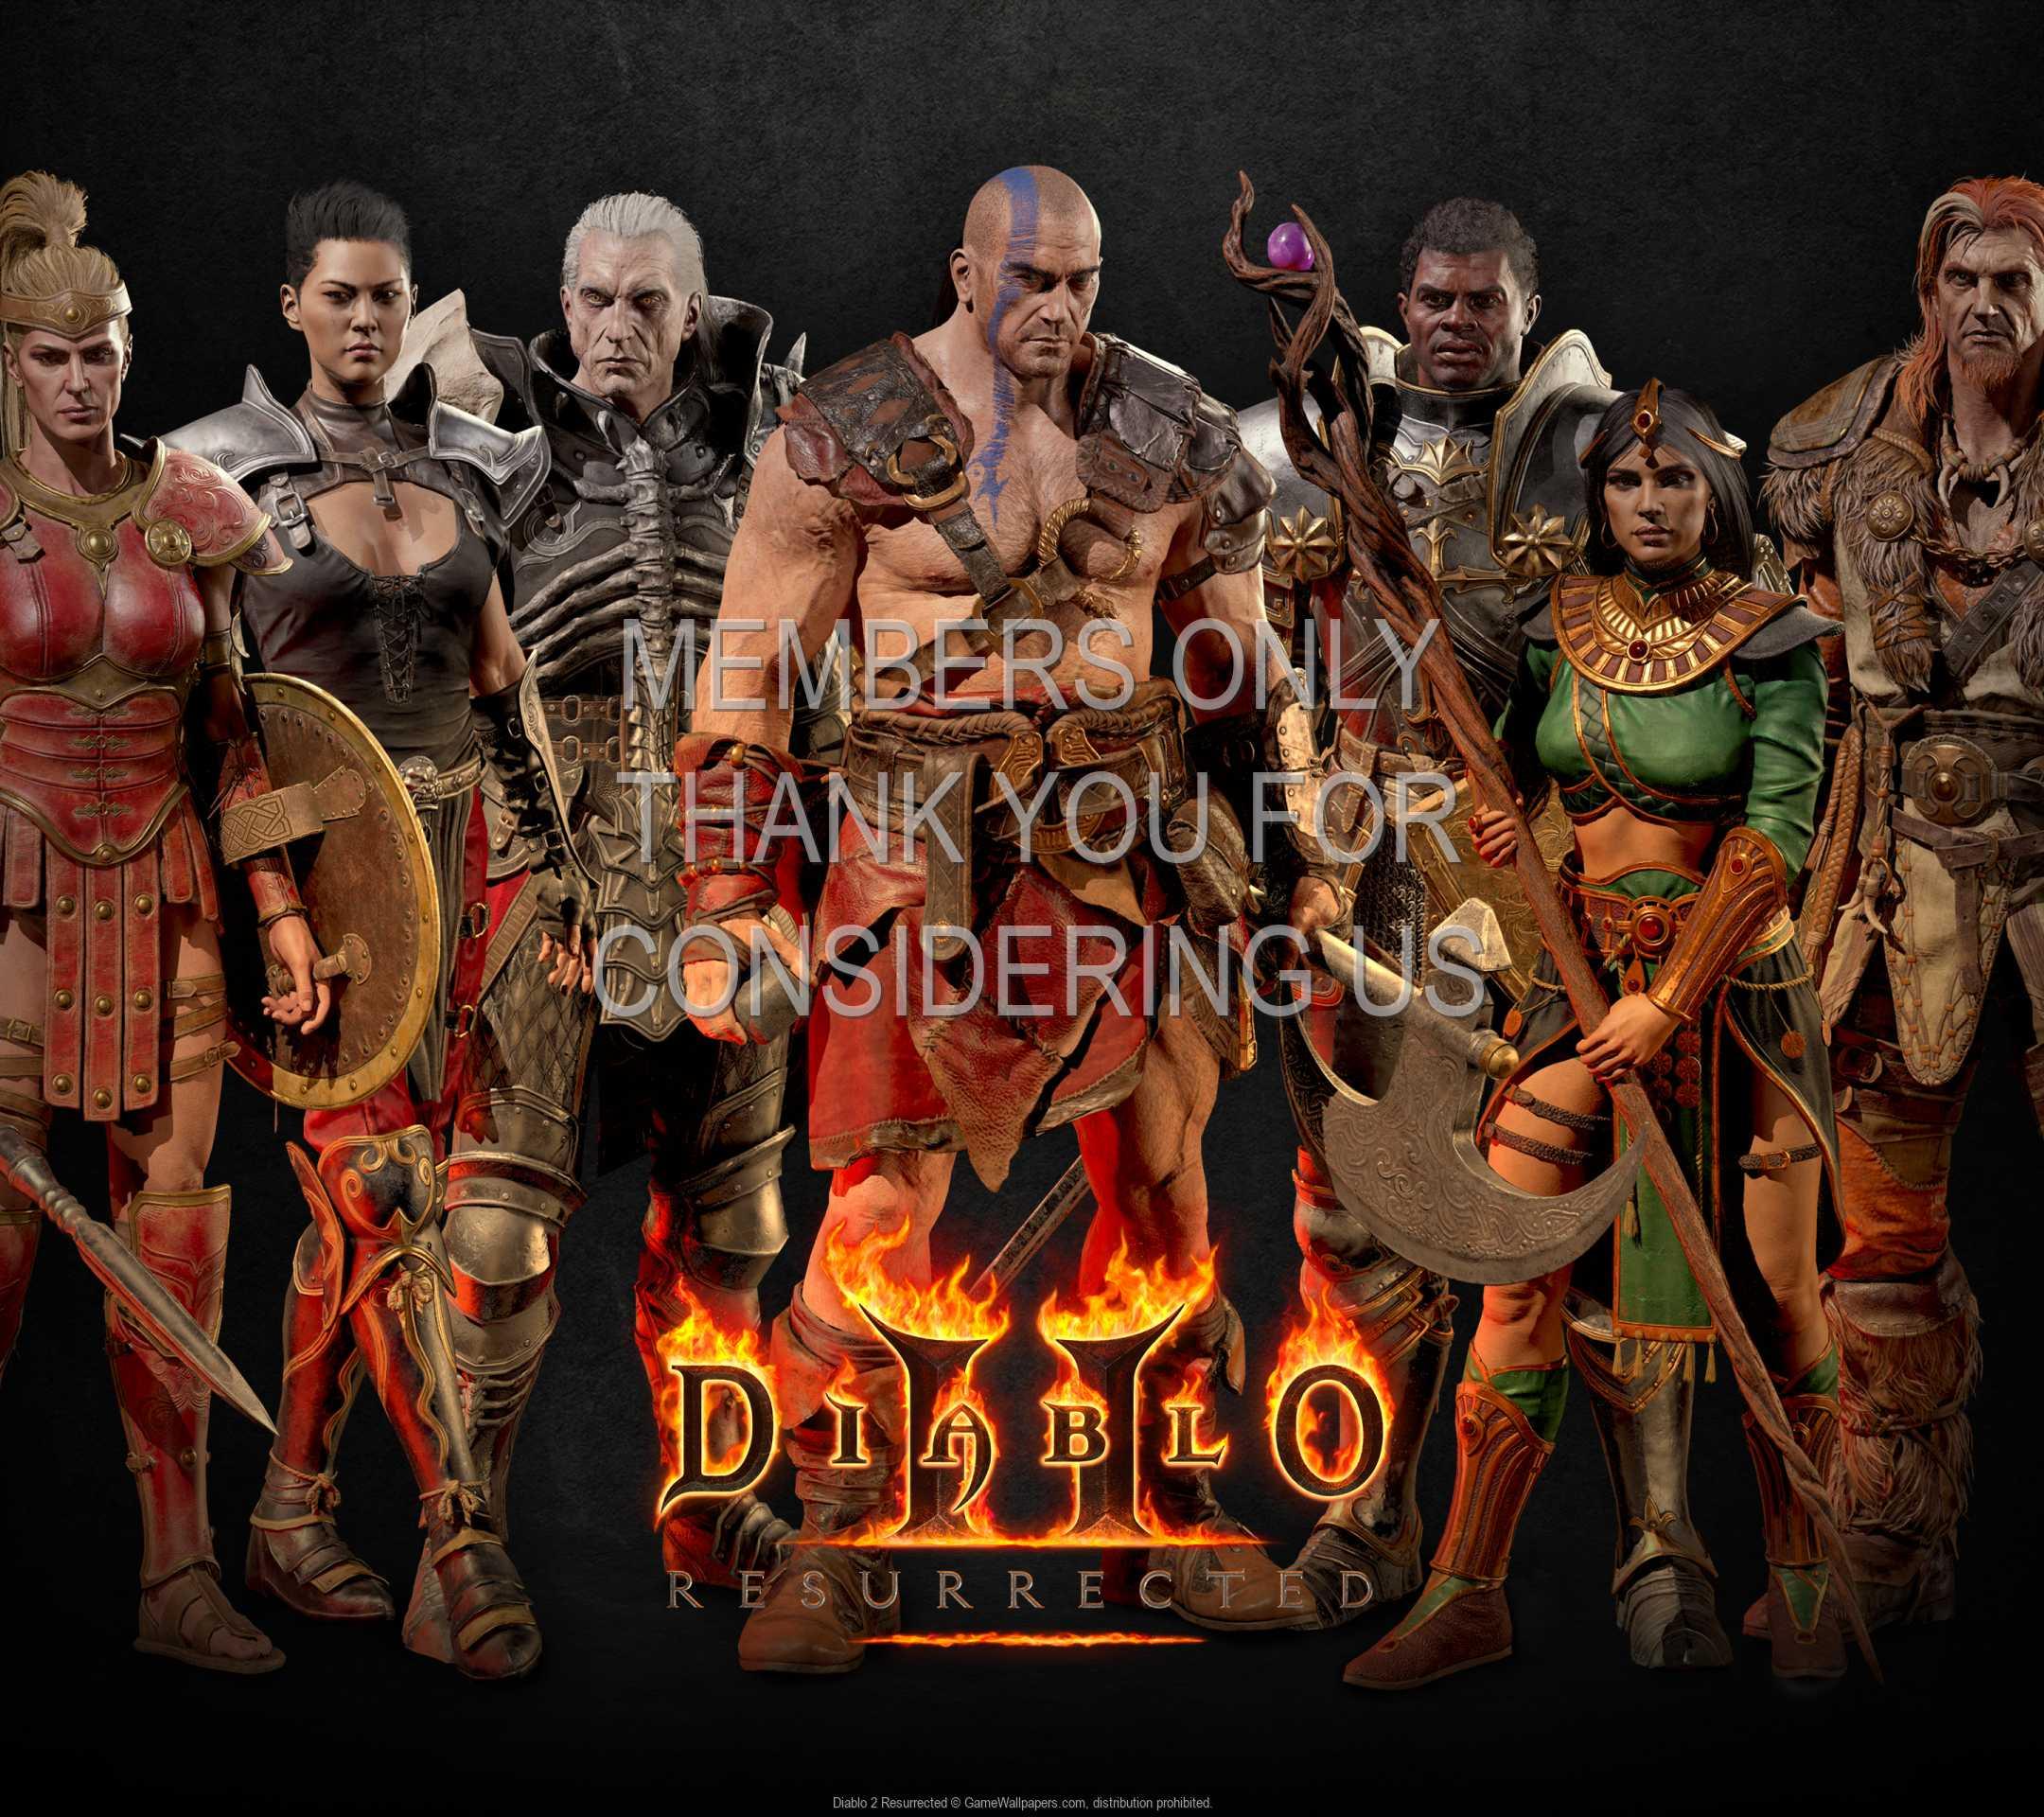 Diablo 2: Resurrected 1080p Horizontal Mobile wallpaper or background 03